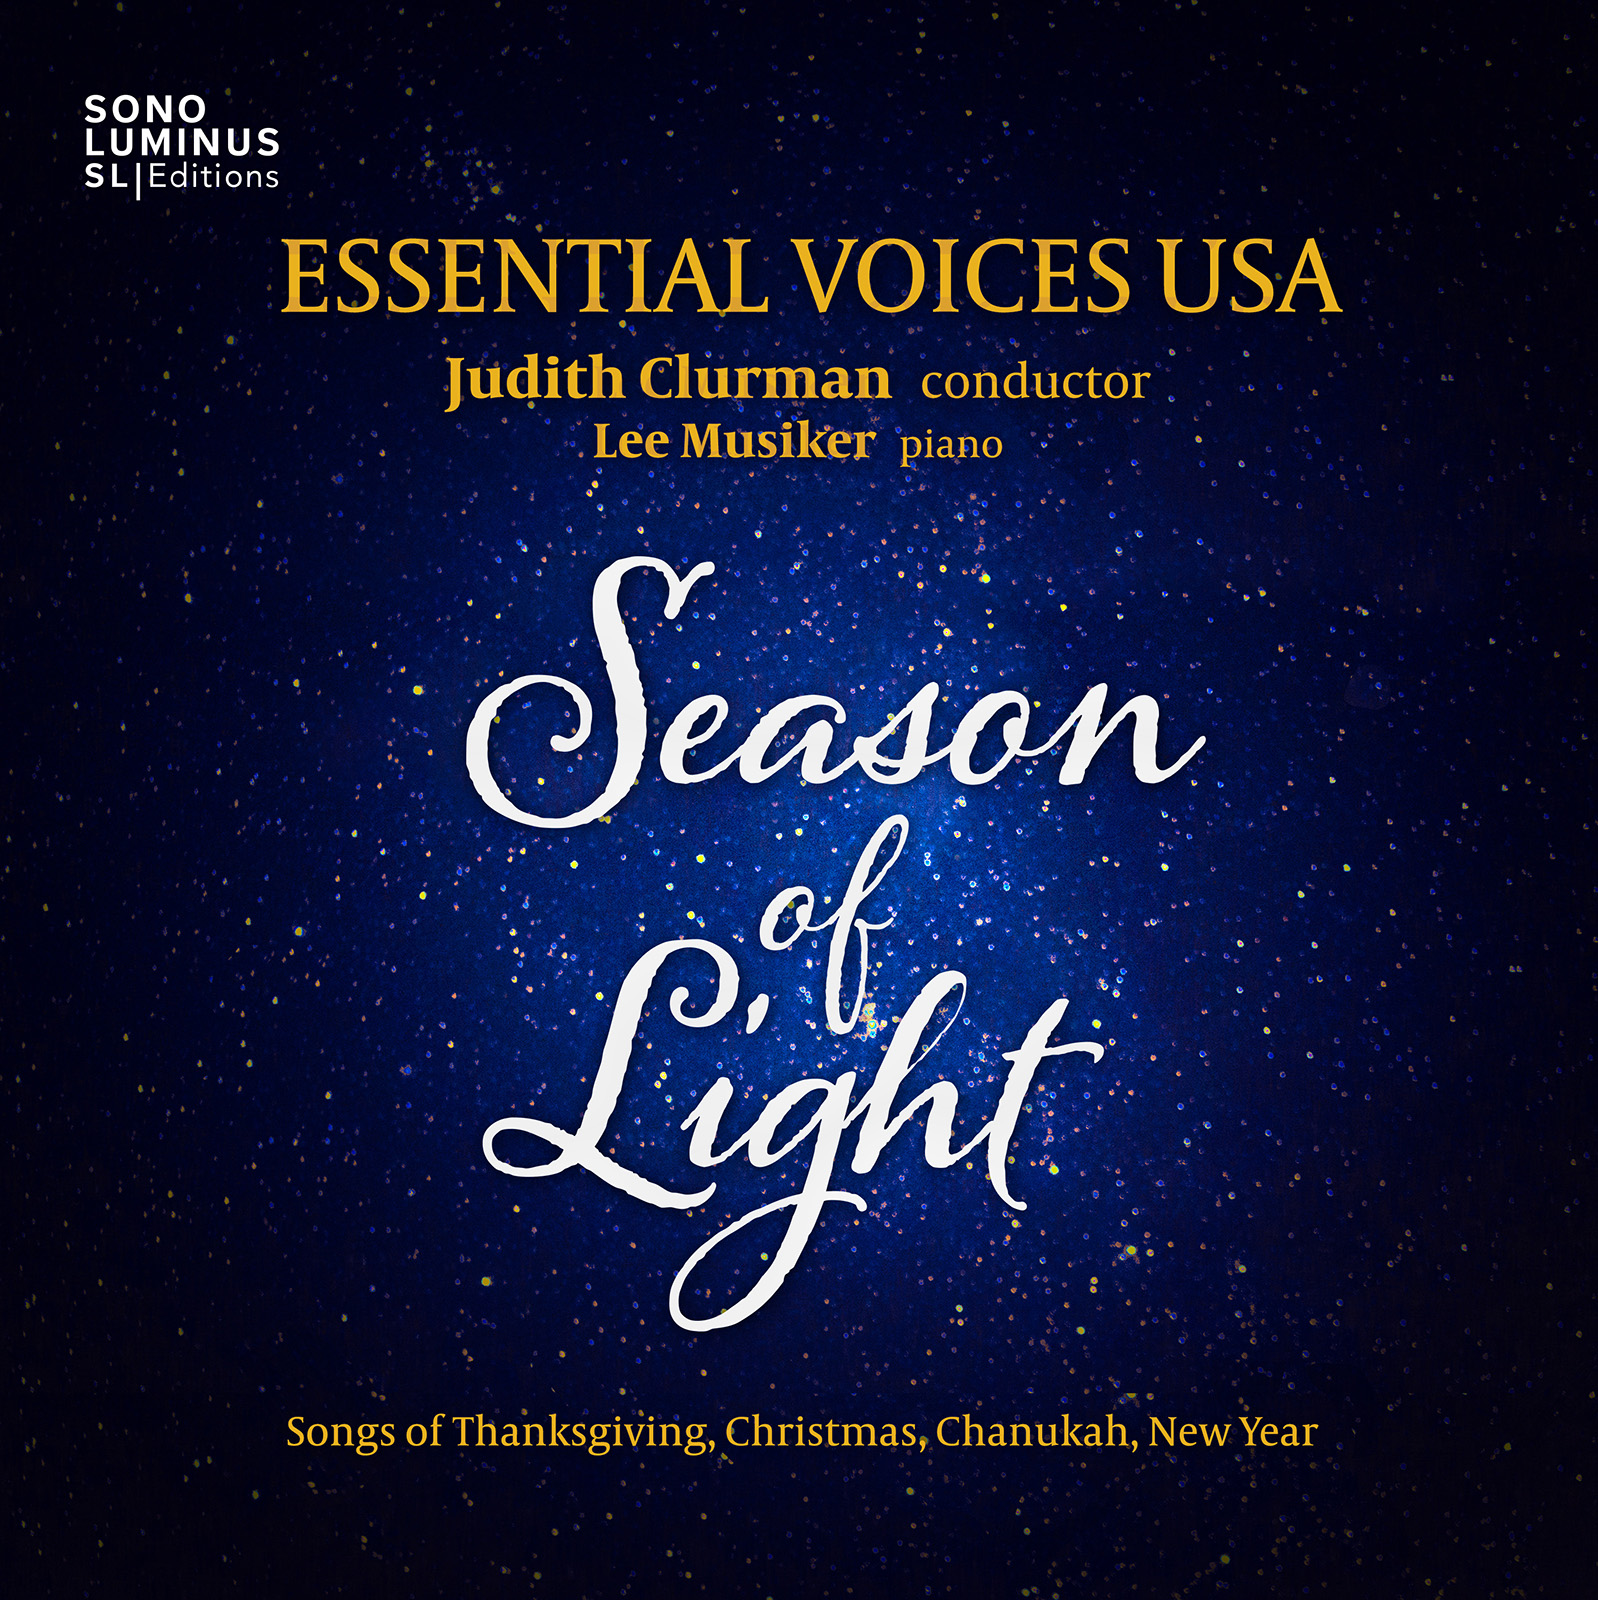 Season of Light: Songs of Thanksgiving, Christmas, Chanukah, New Year